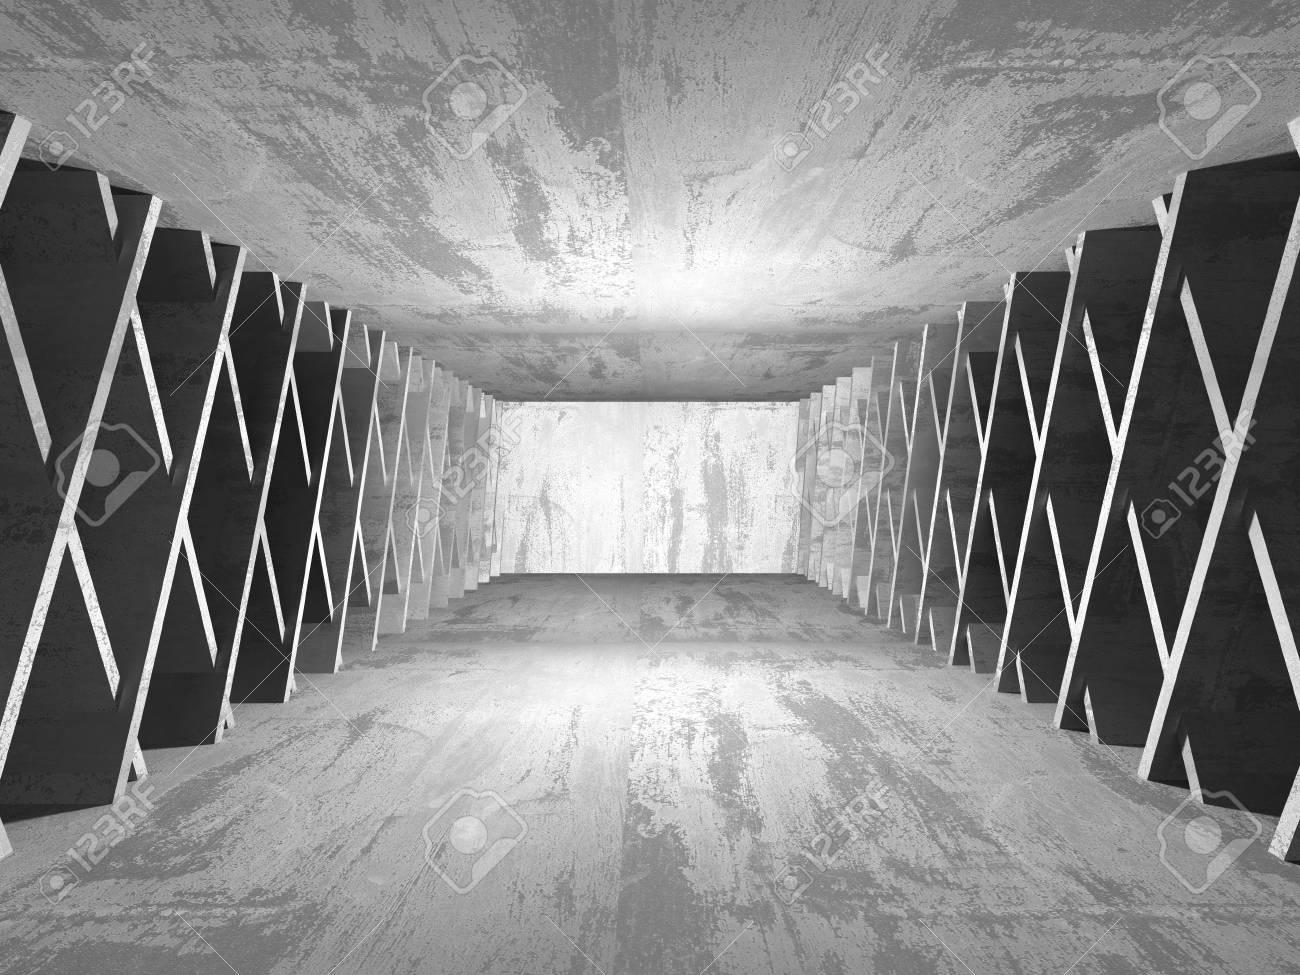 Cuarto Oscuro Fotografia | Fondo De Arquitectura Concreta Resumen Cuarto Oscuro Vacio